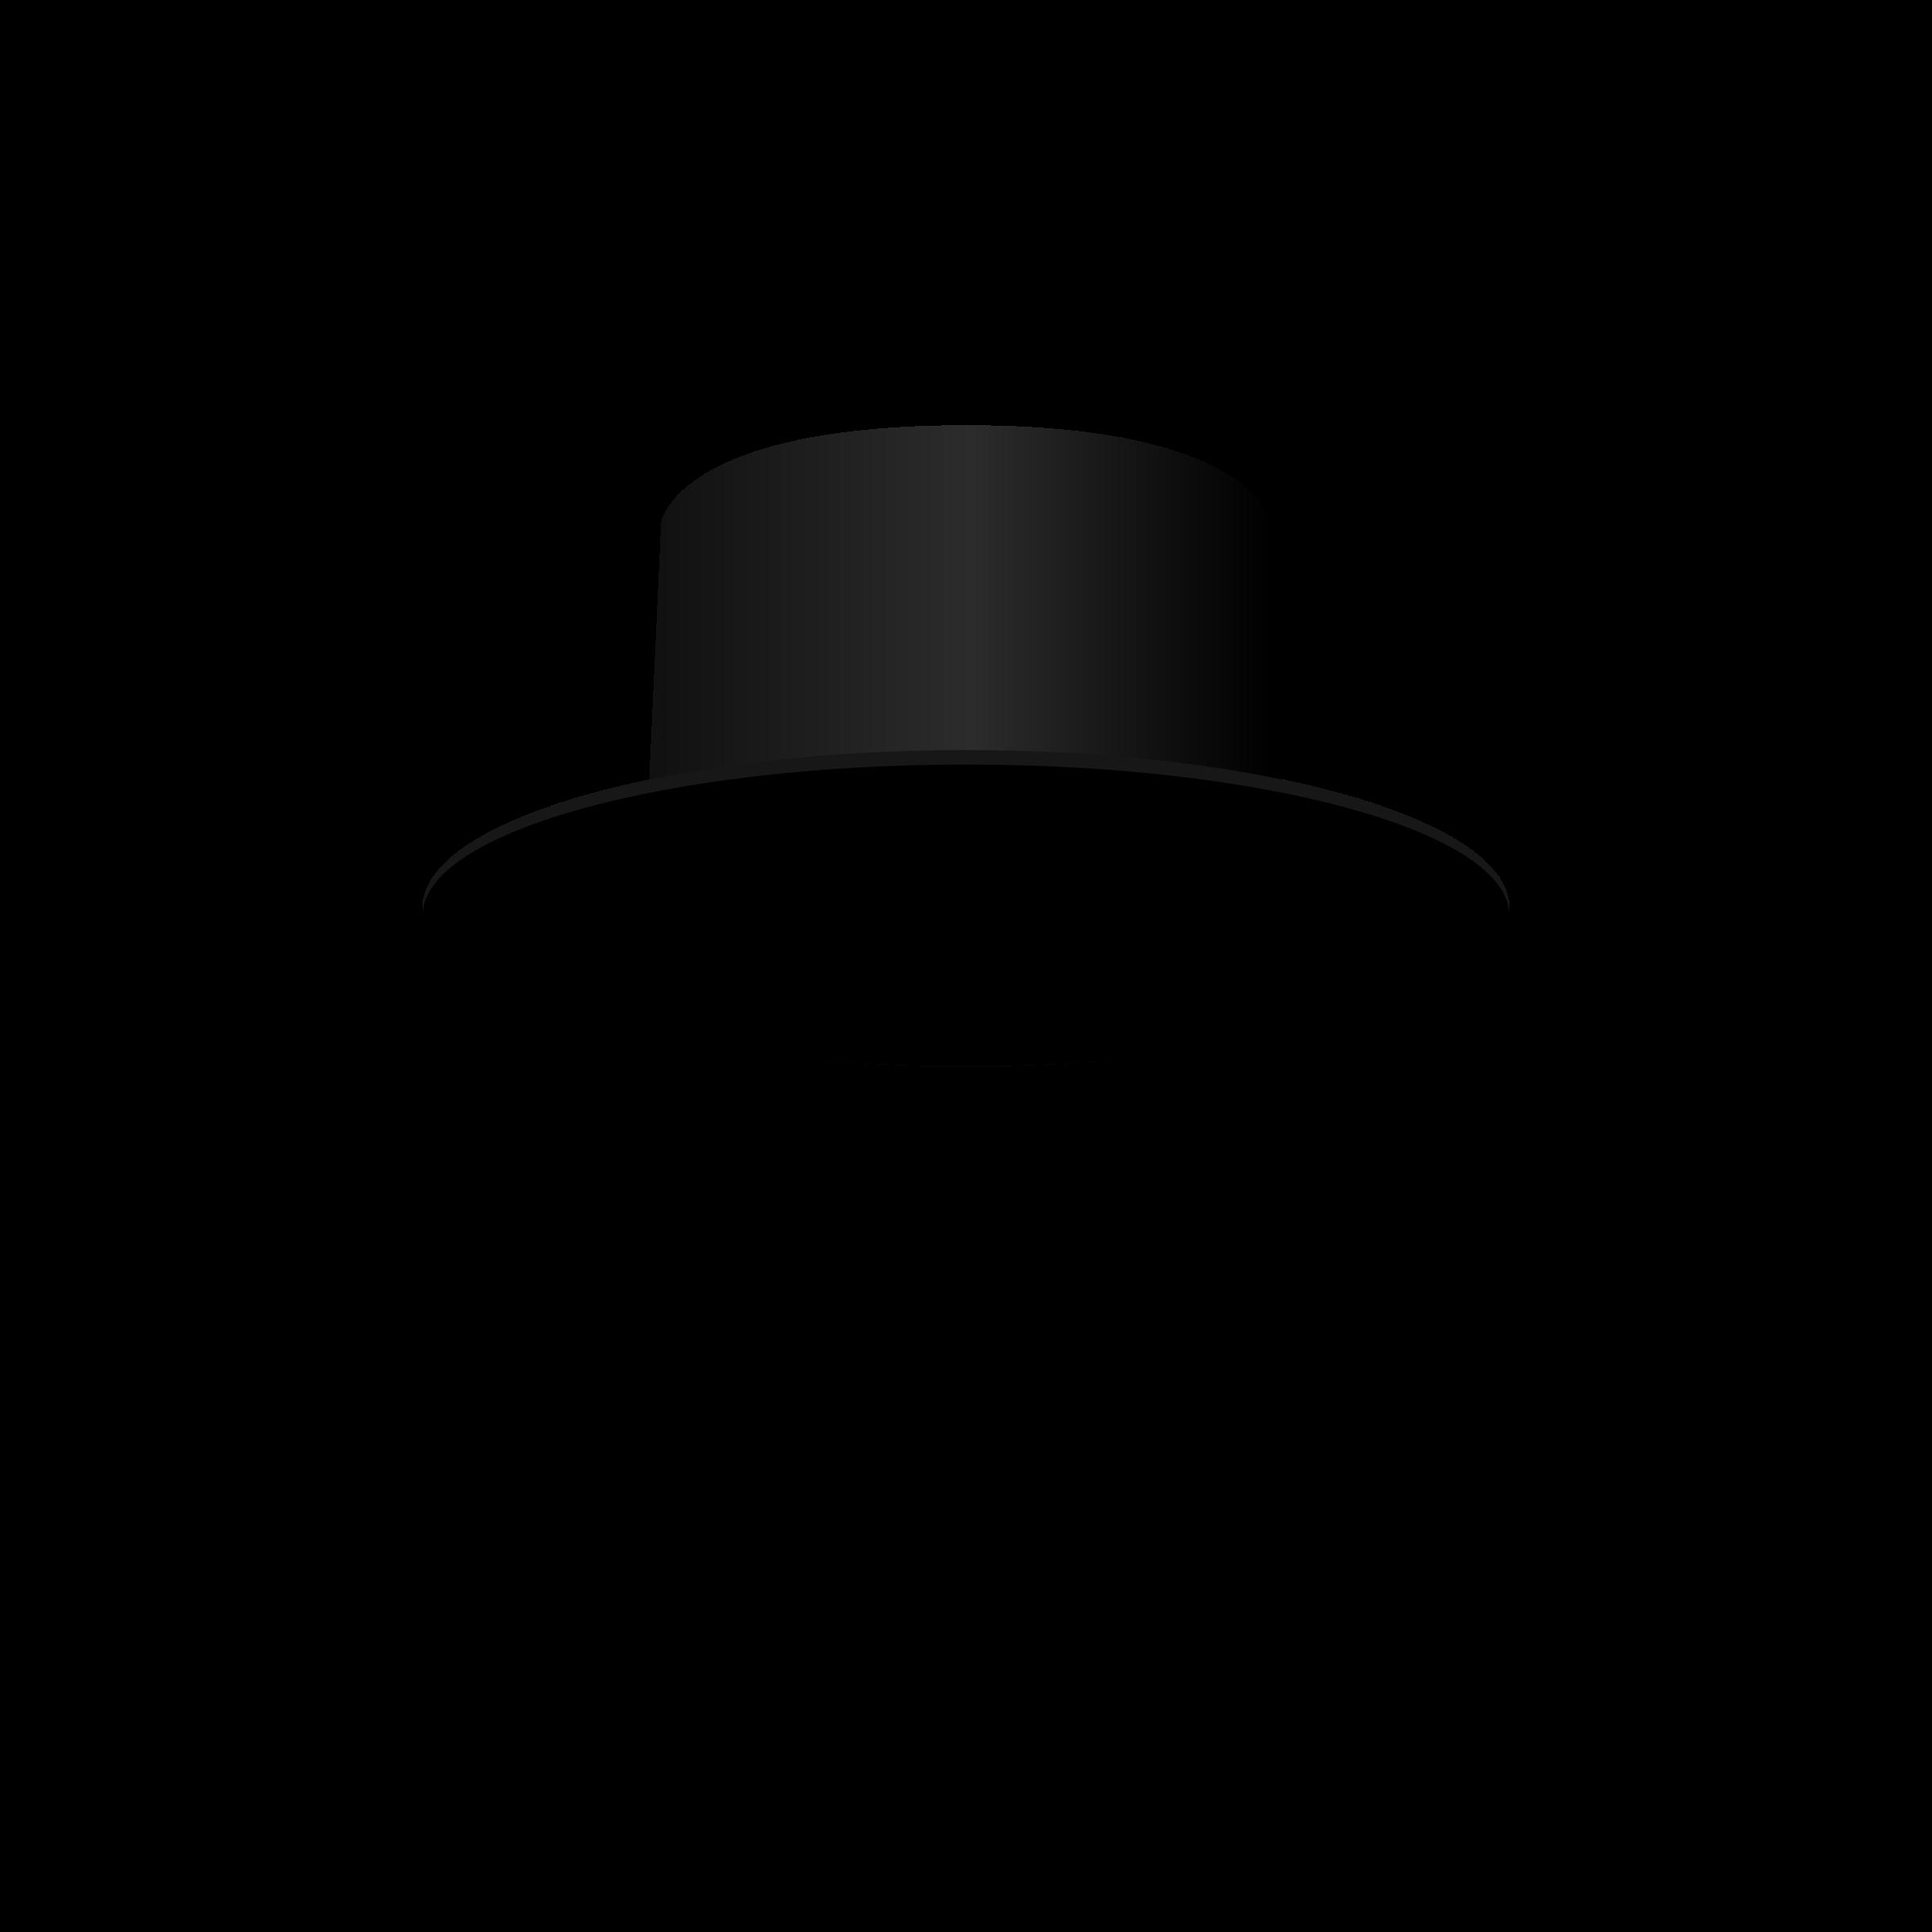 Jewish Hat With Curls